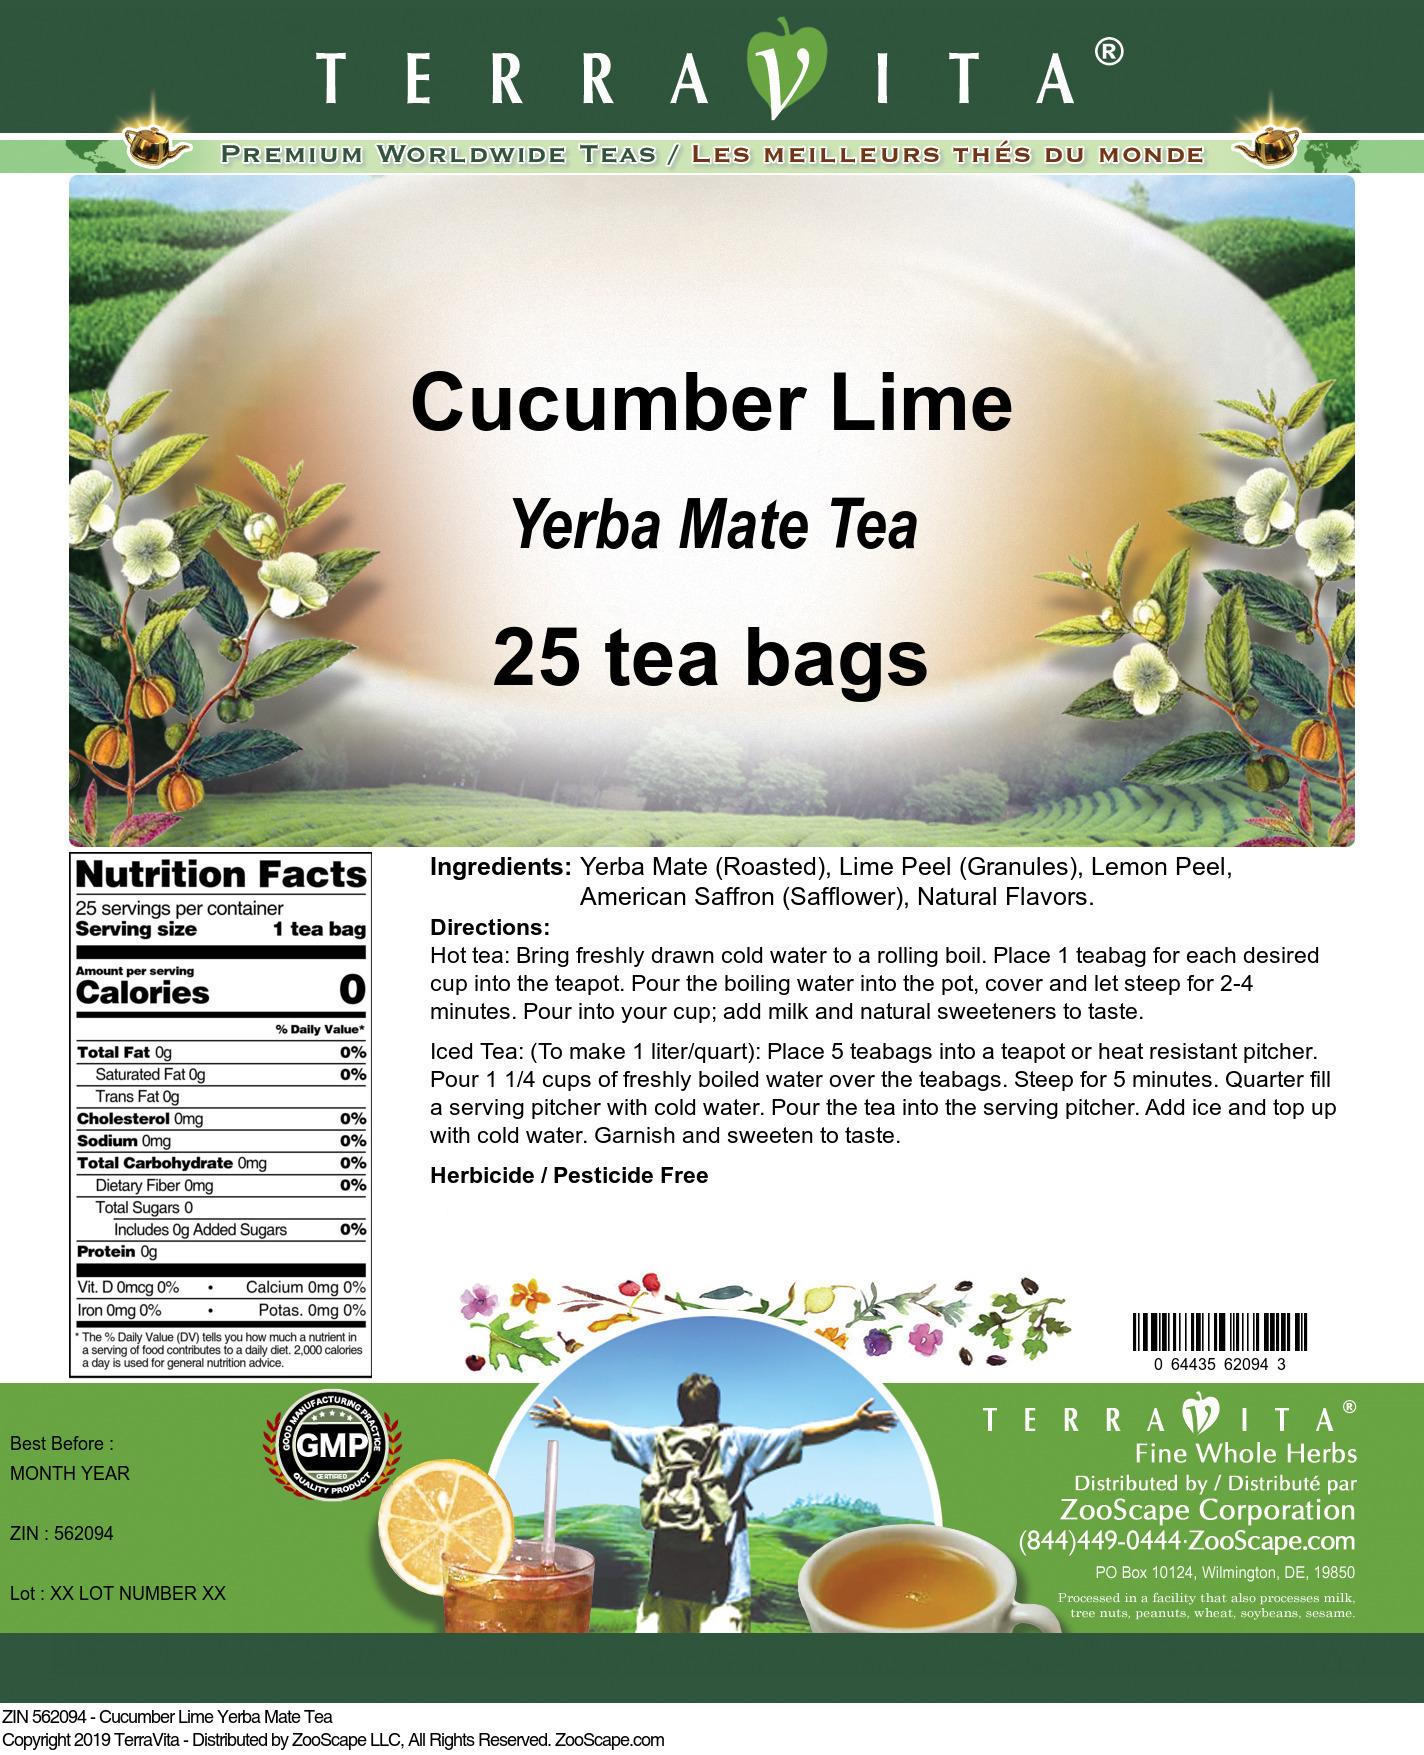 Cucumber Lime Yerba Mate Tea